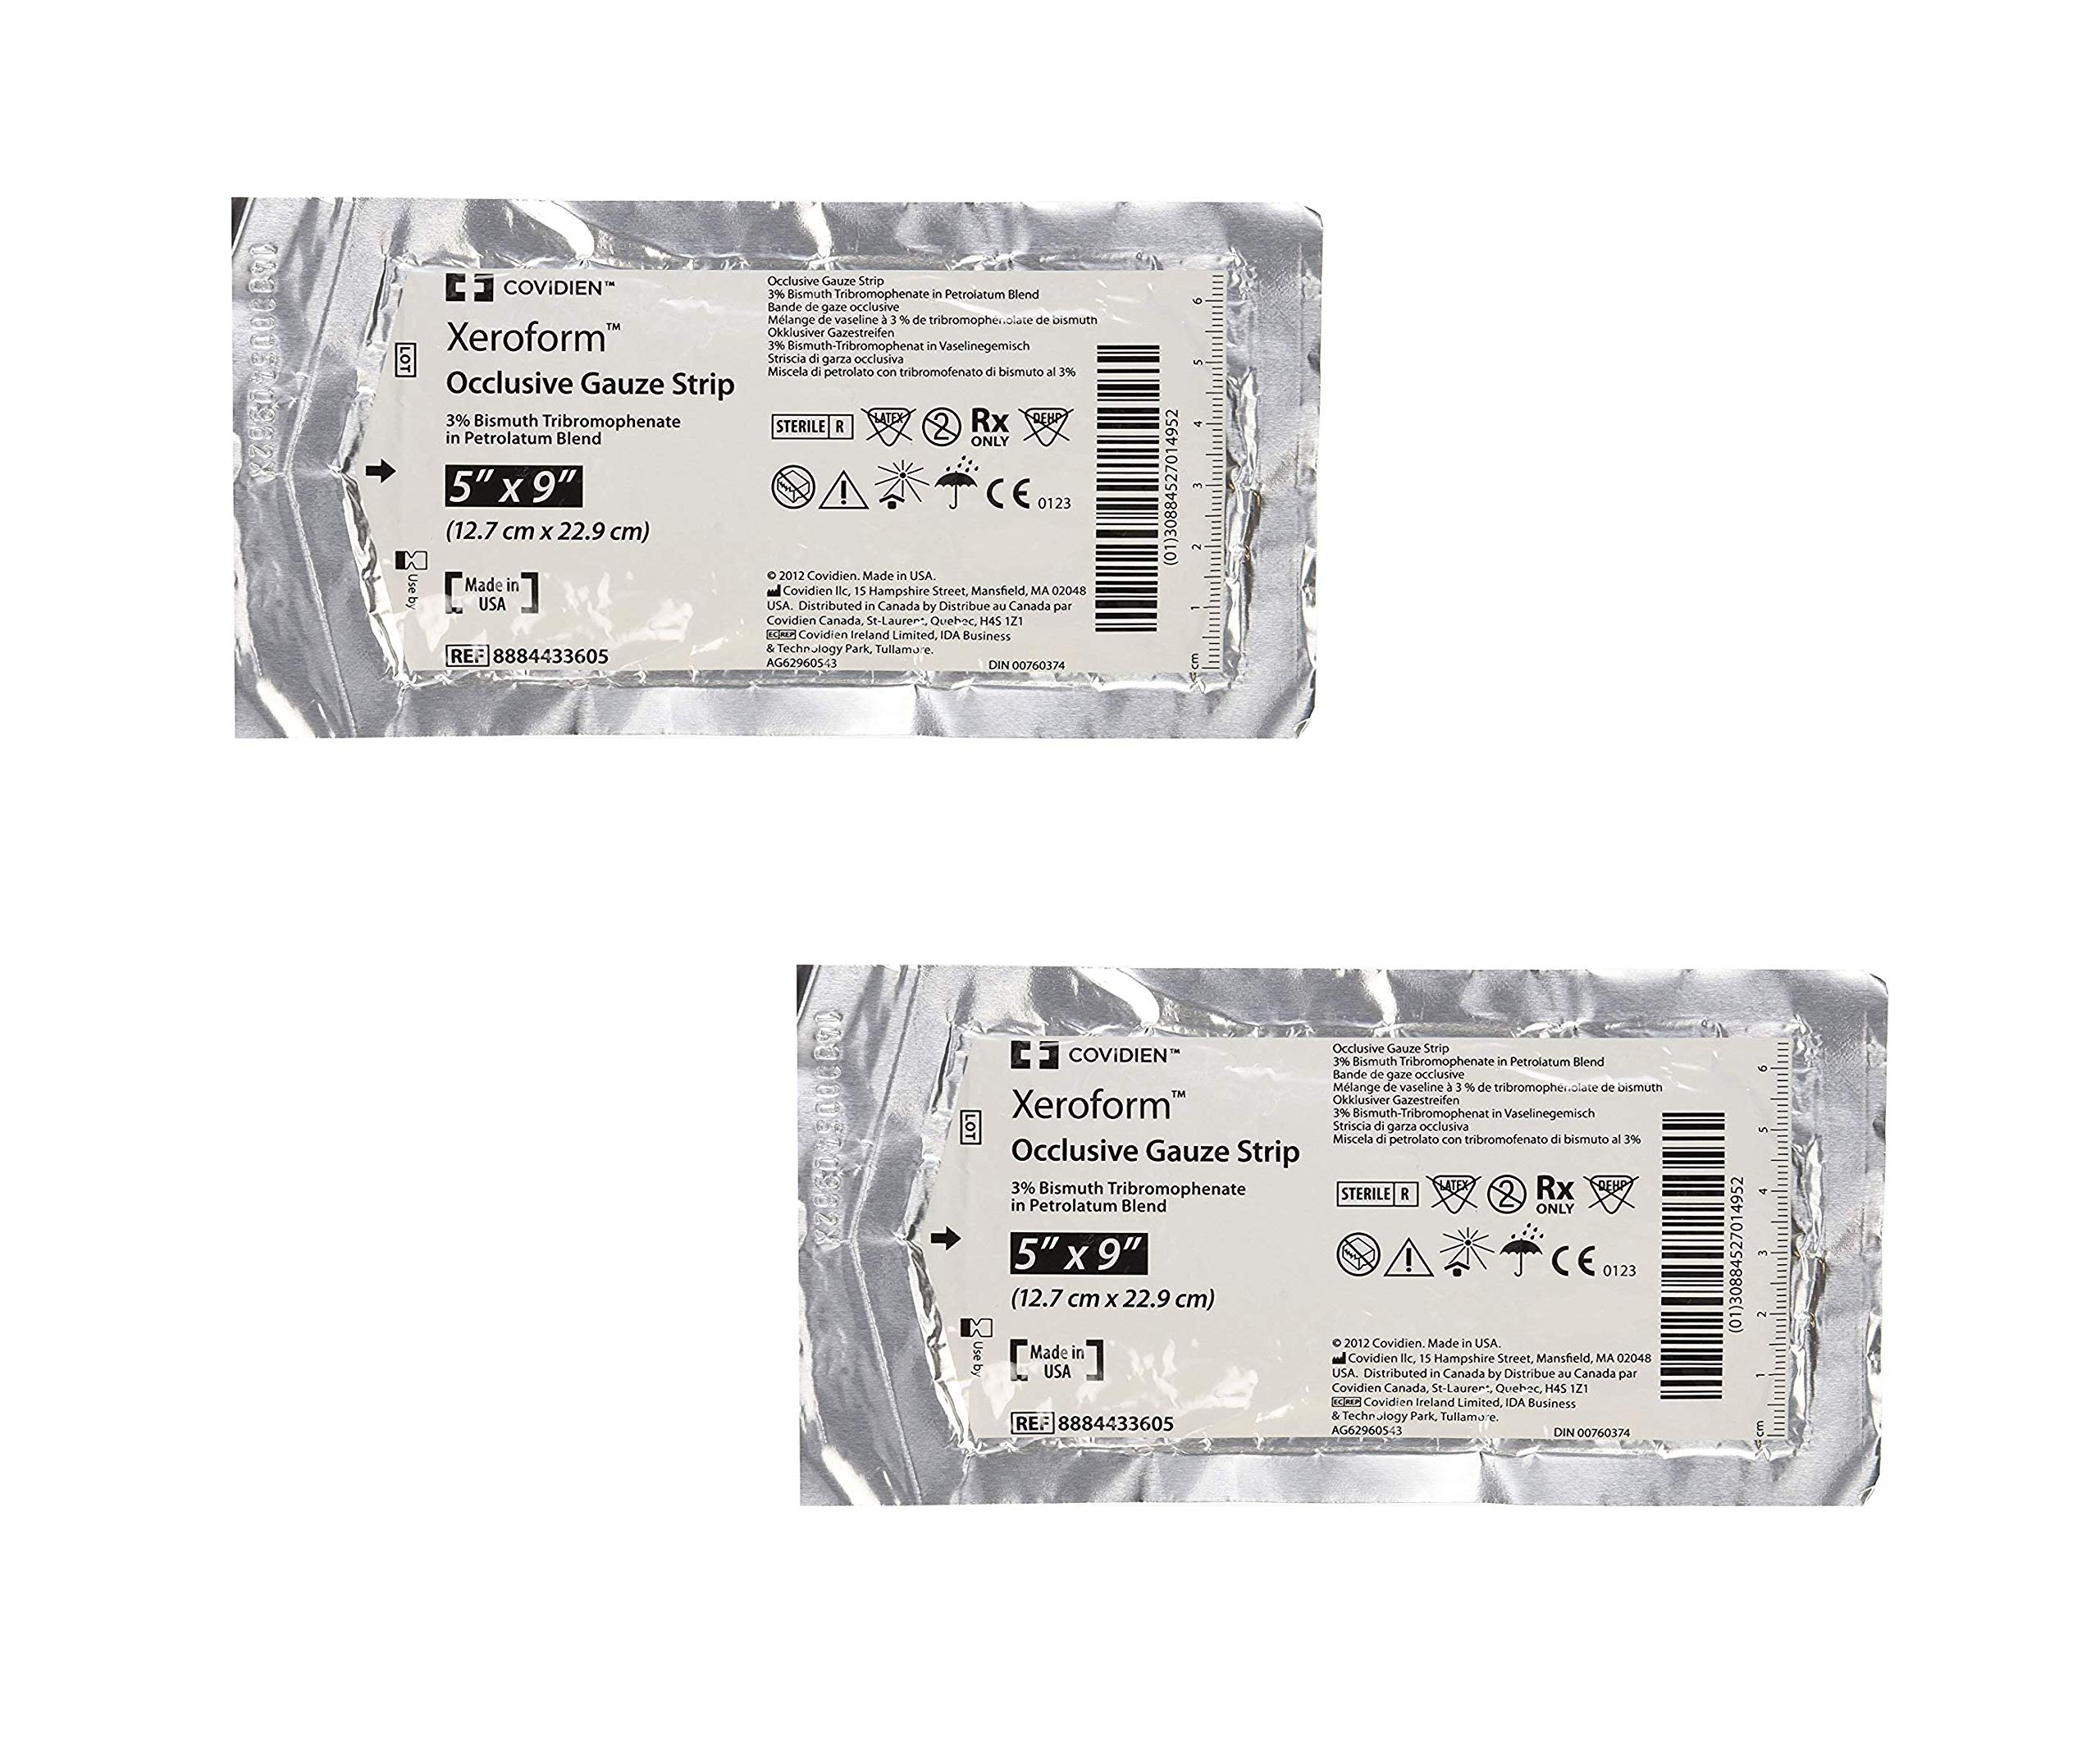 DSS Xeroform Occlusive Petrolatum Gauze Strip, 5'' X 9'', 50 Count (2 Pack)